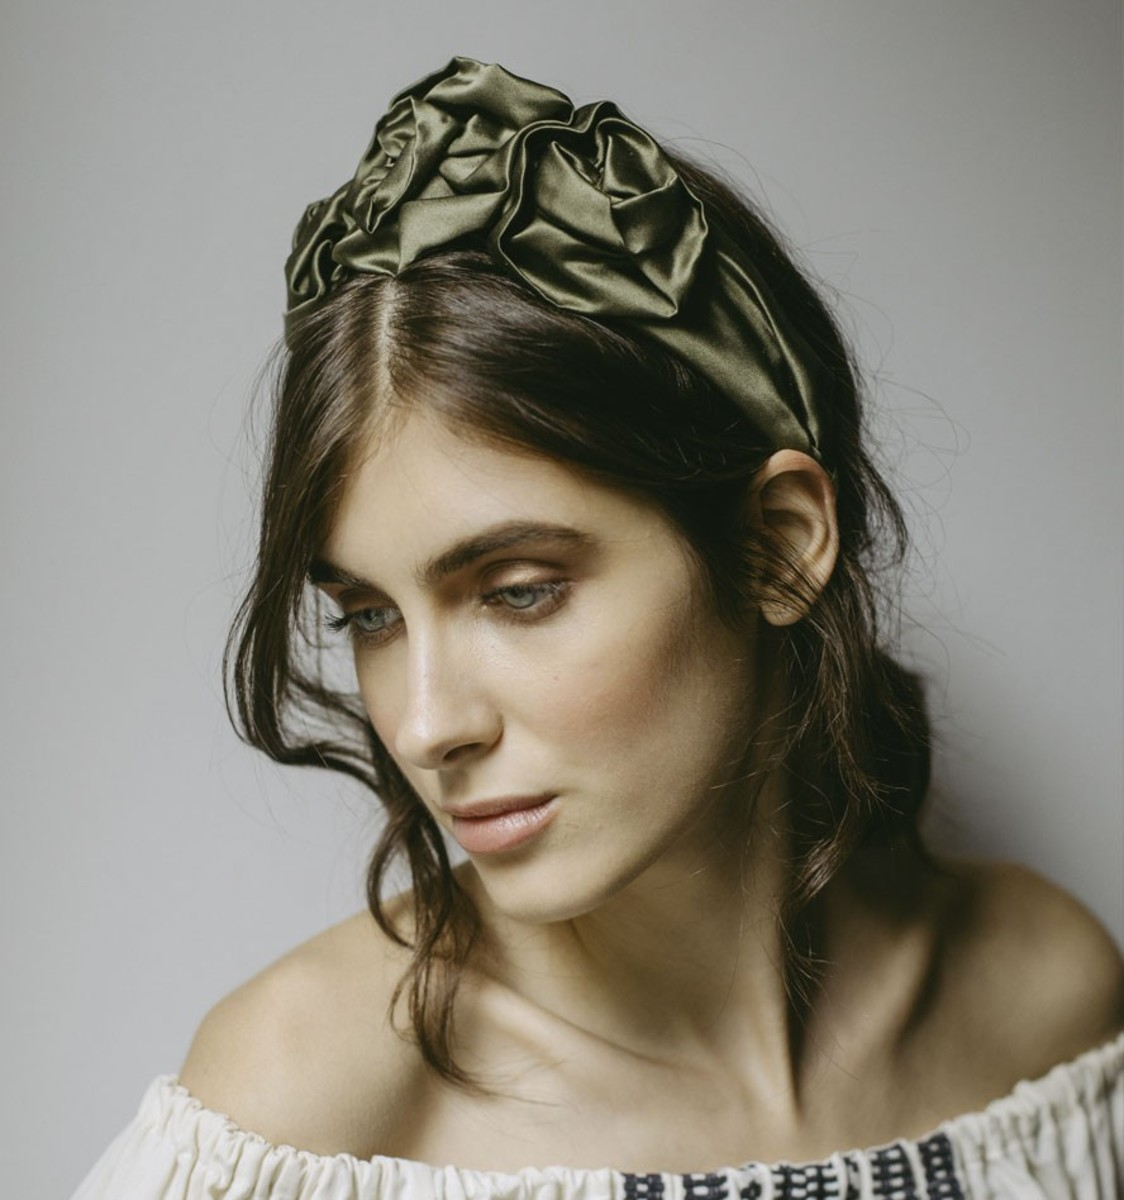 Jennifer Behr Rosette headband in Olive, $325, available here.